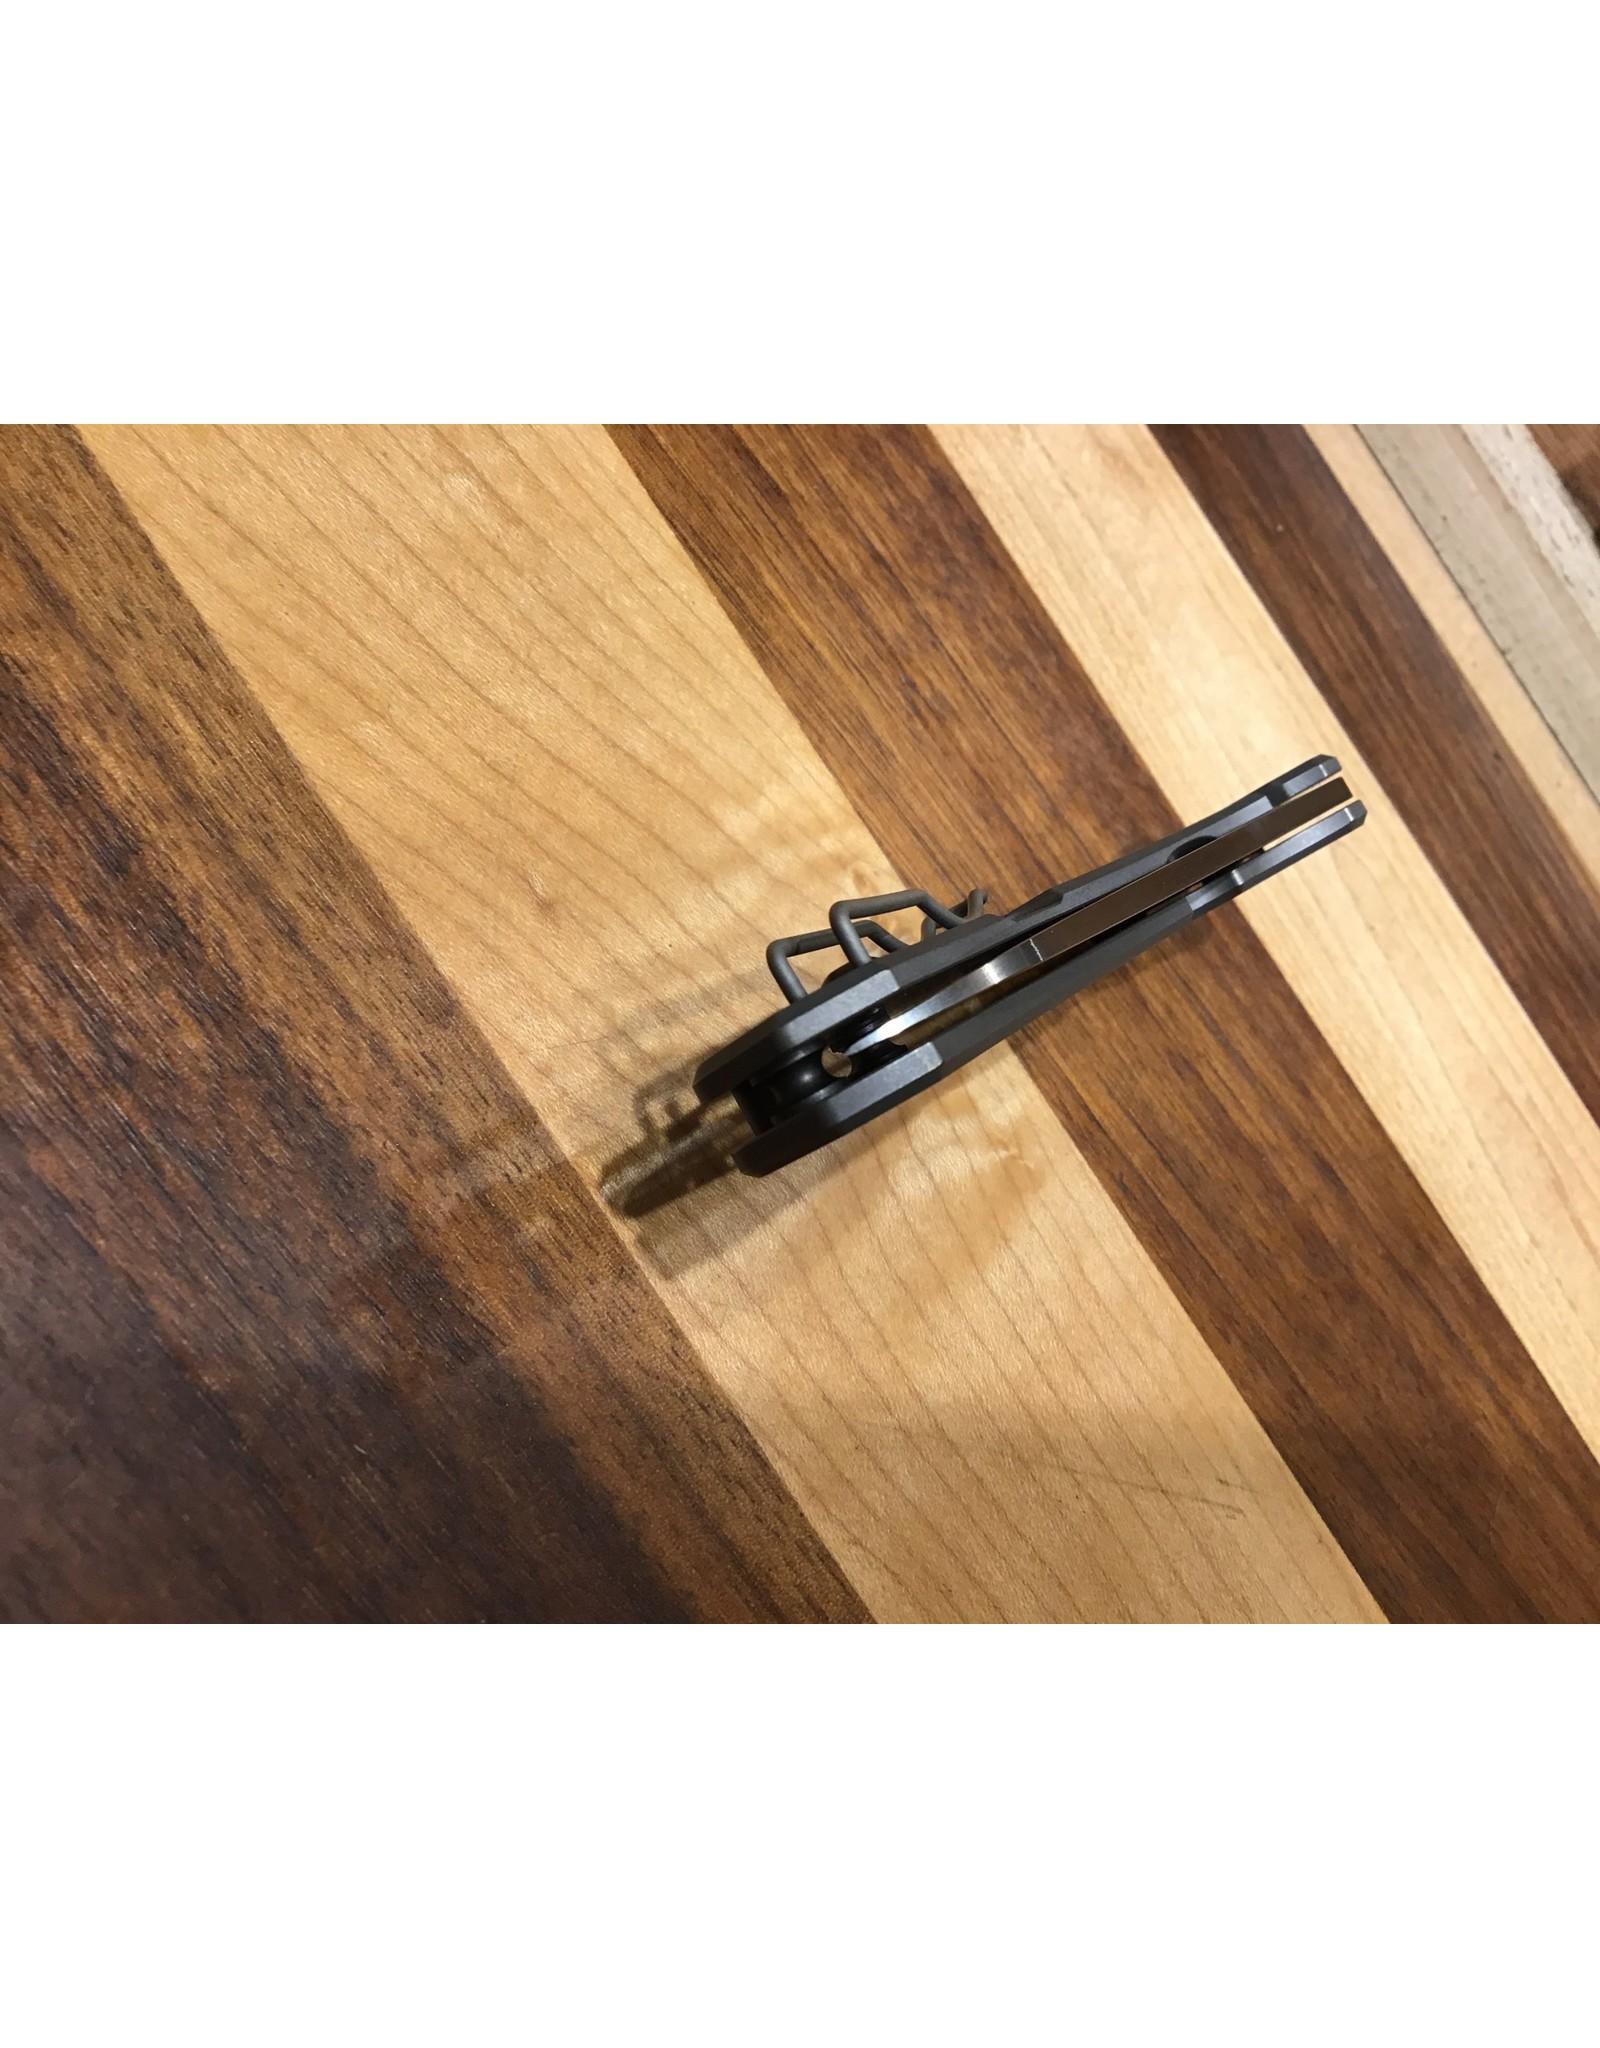 Spyderco Spyderco SpydieChef Titanium Frame Lock